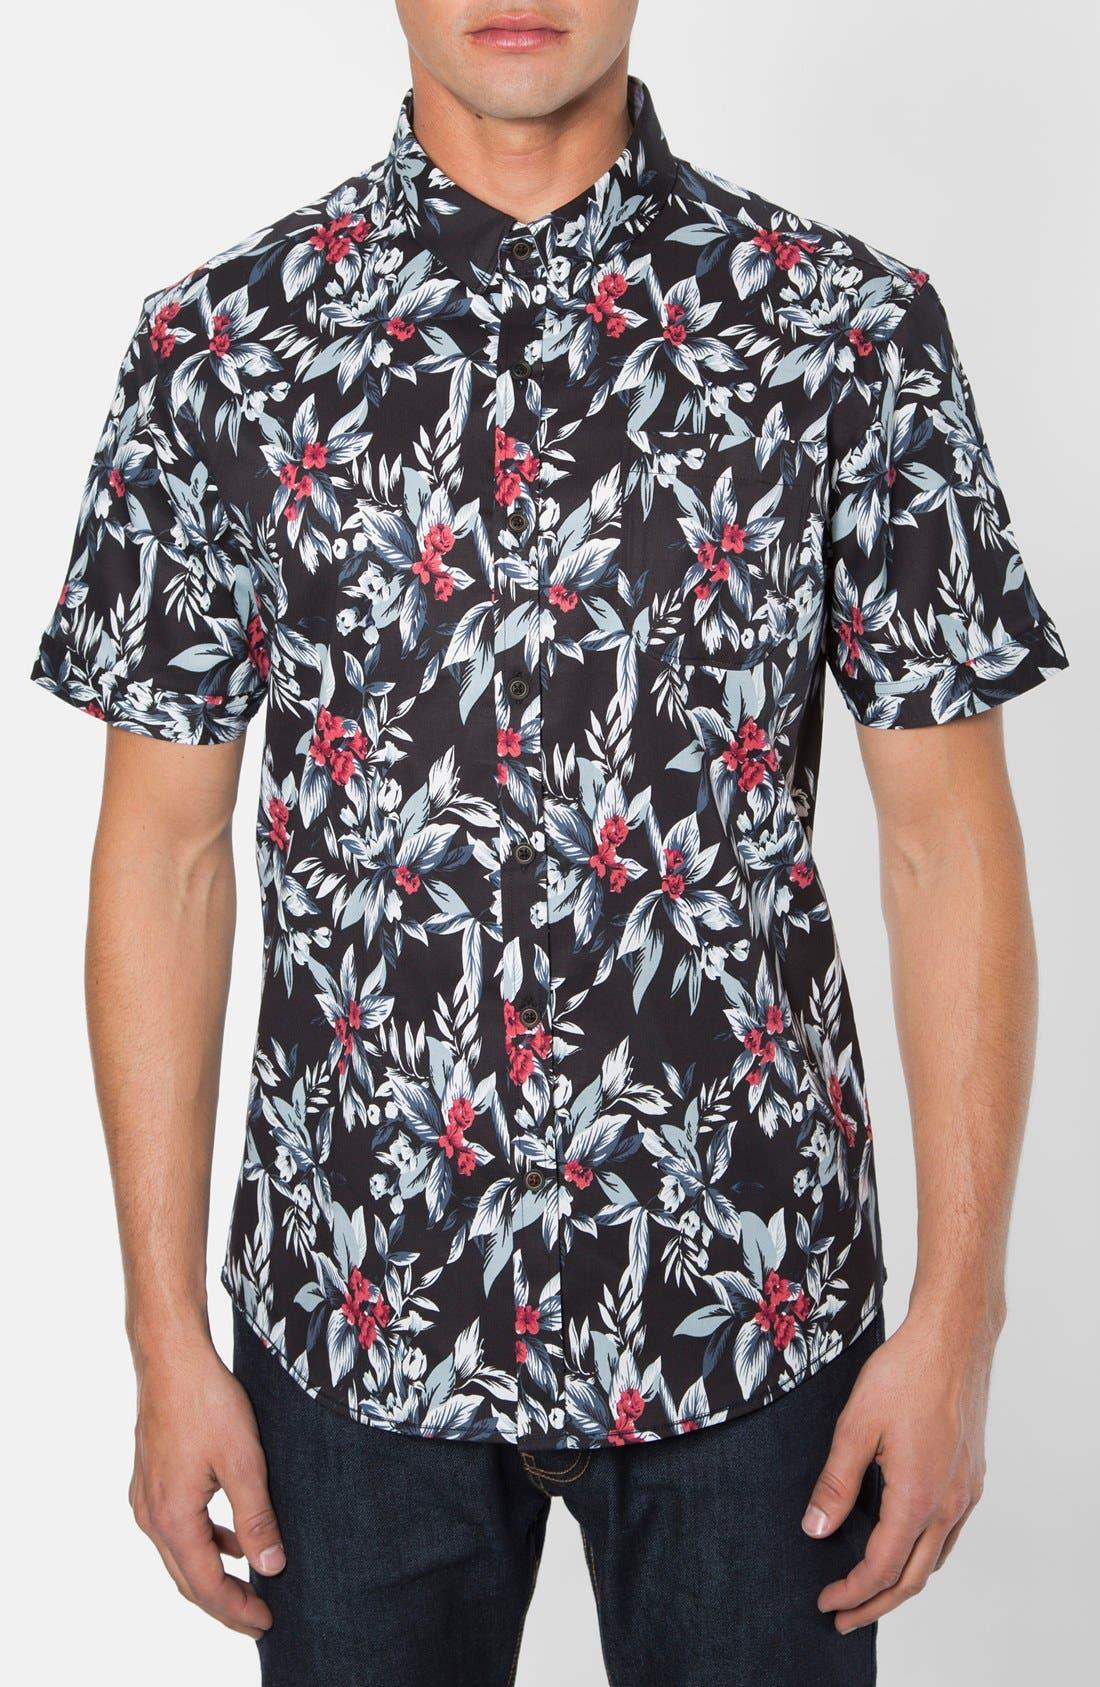 7 Diamonds 'Ignition' Trim Fit Short Sleeve Print Woven Shirt